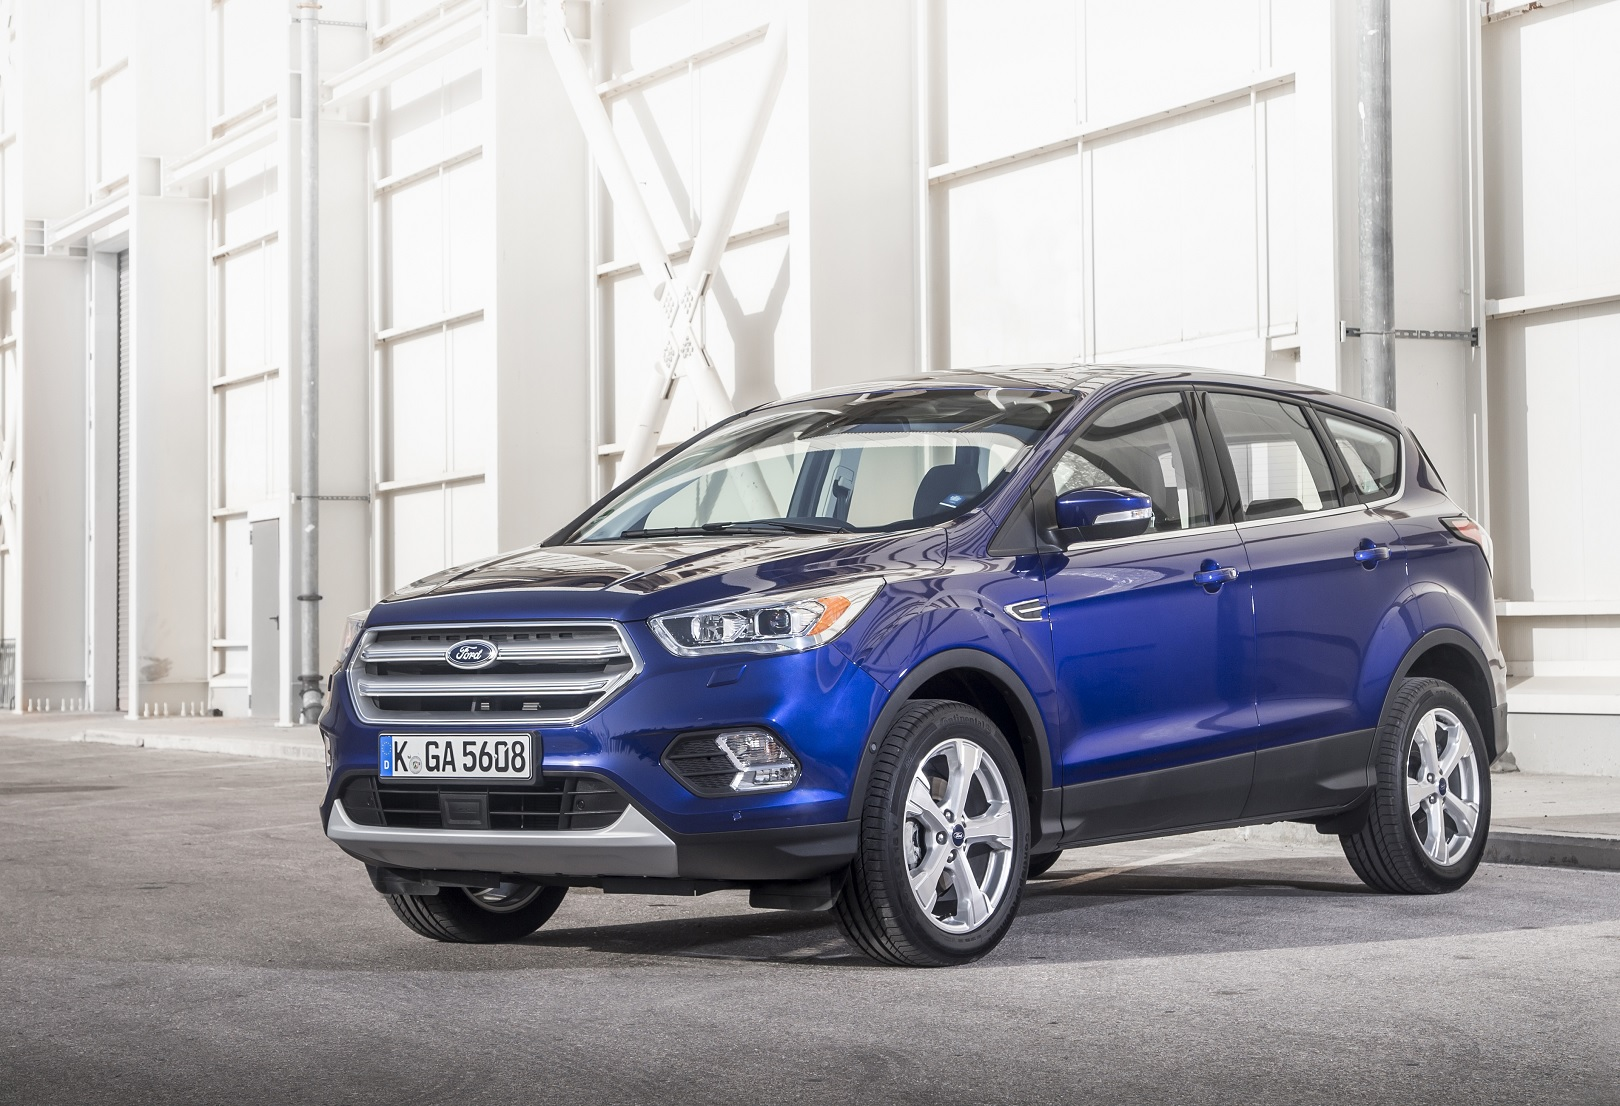 Ford откажется от кроссовера Edge в пользу Kuga